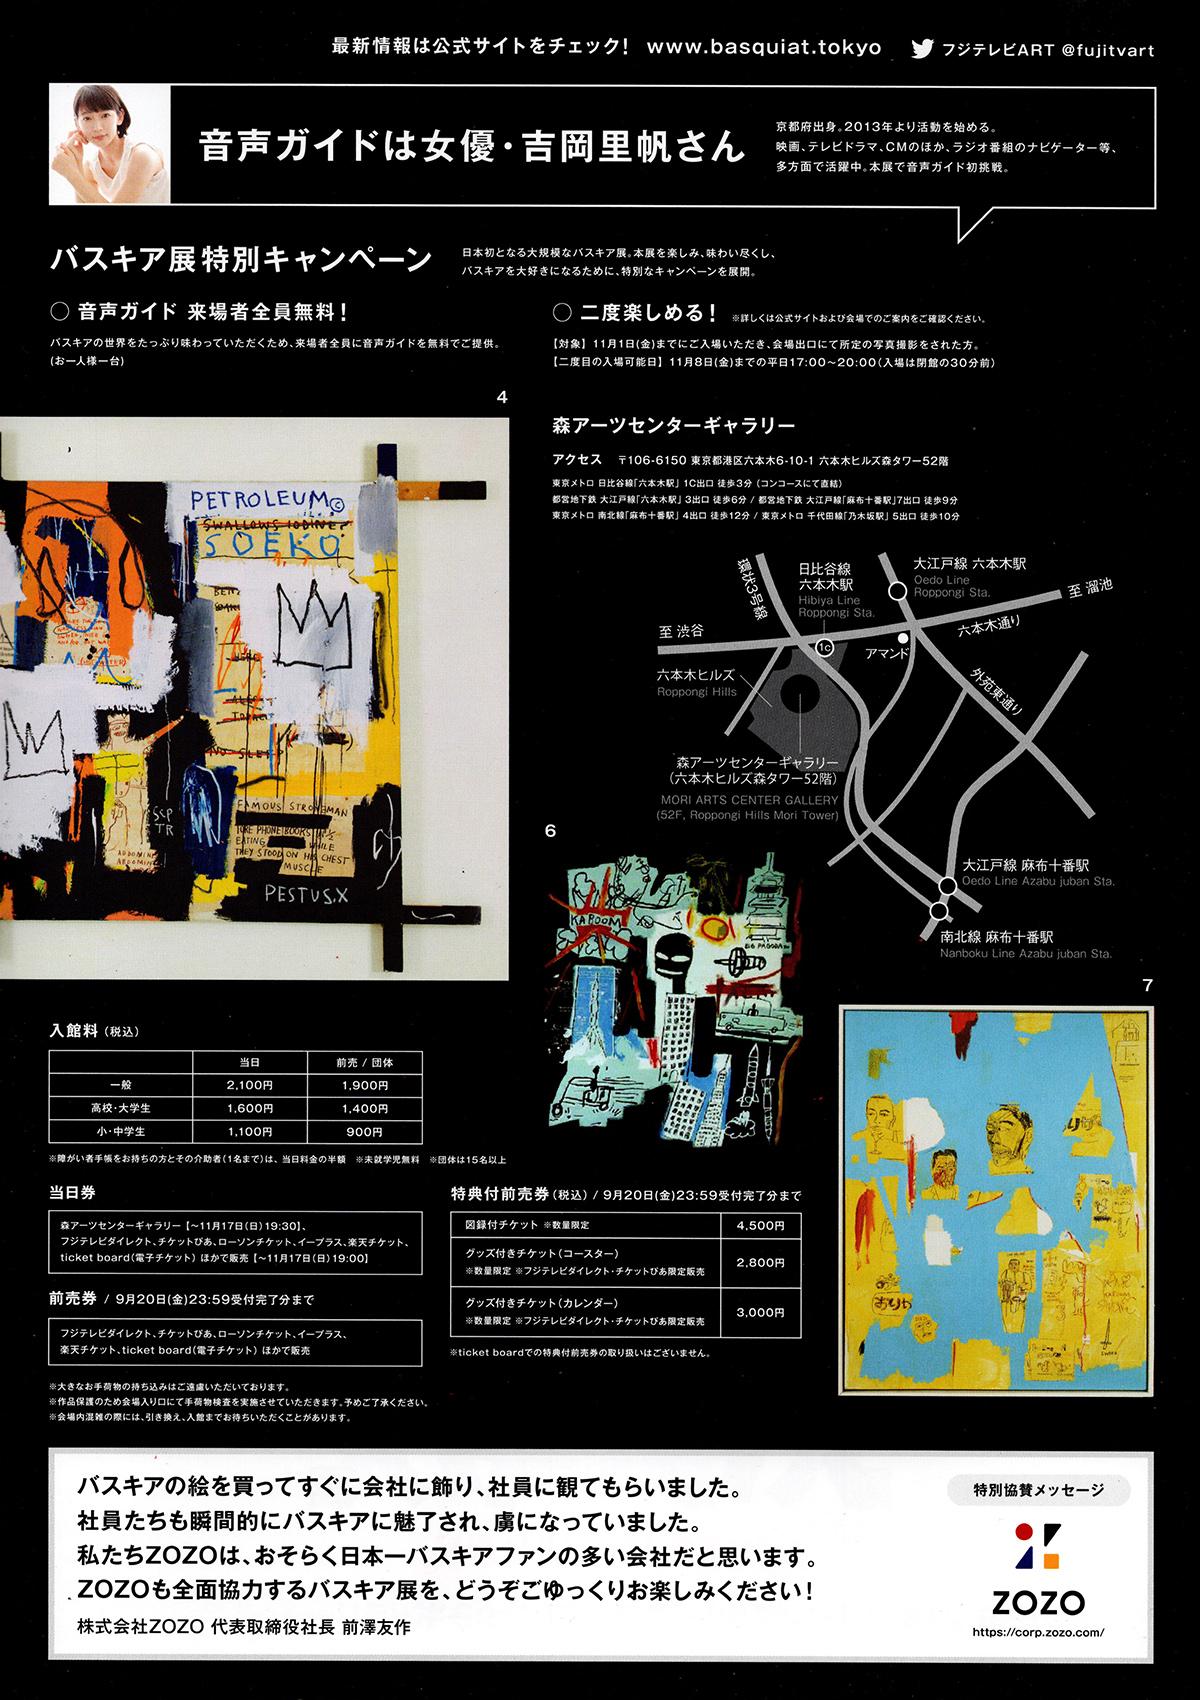 191113_basquiat3.jpg